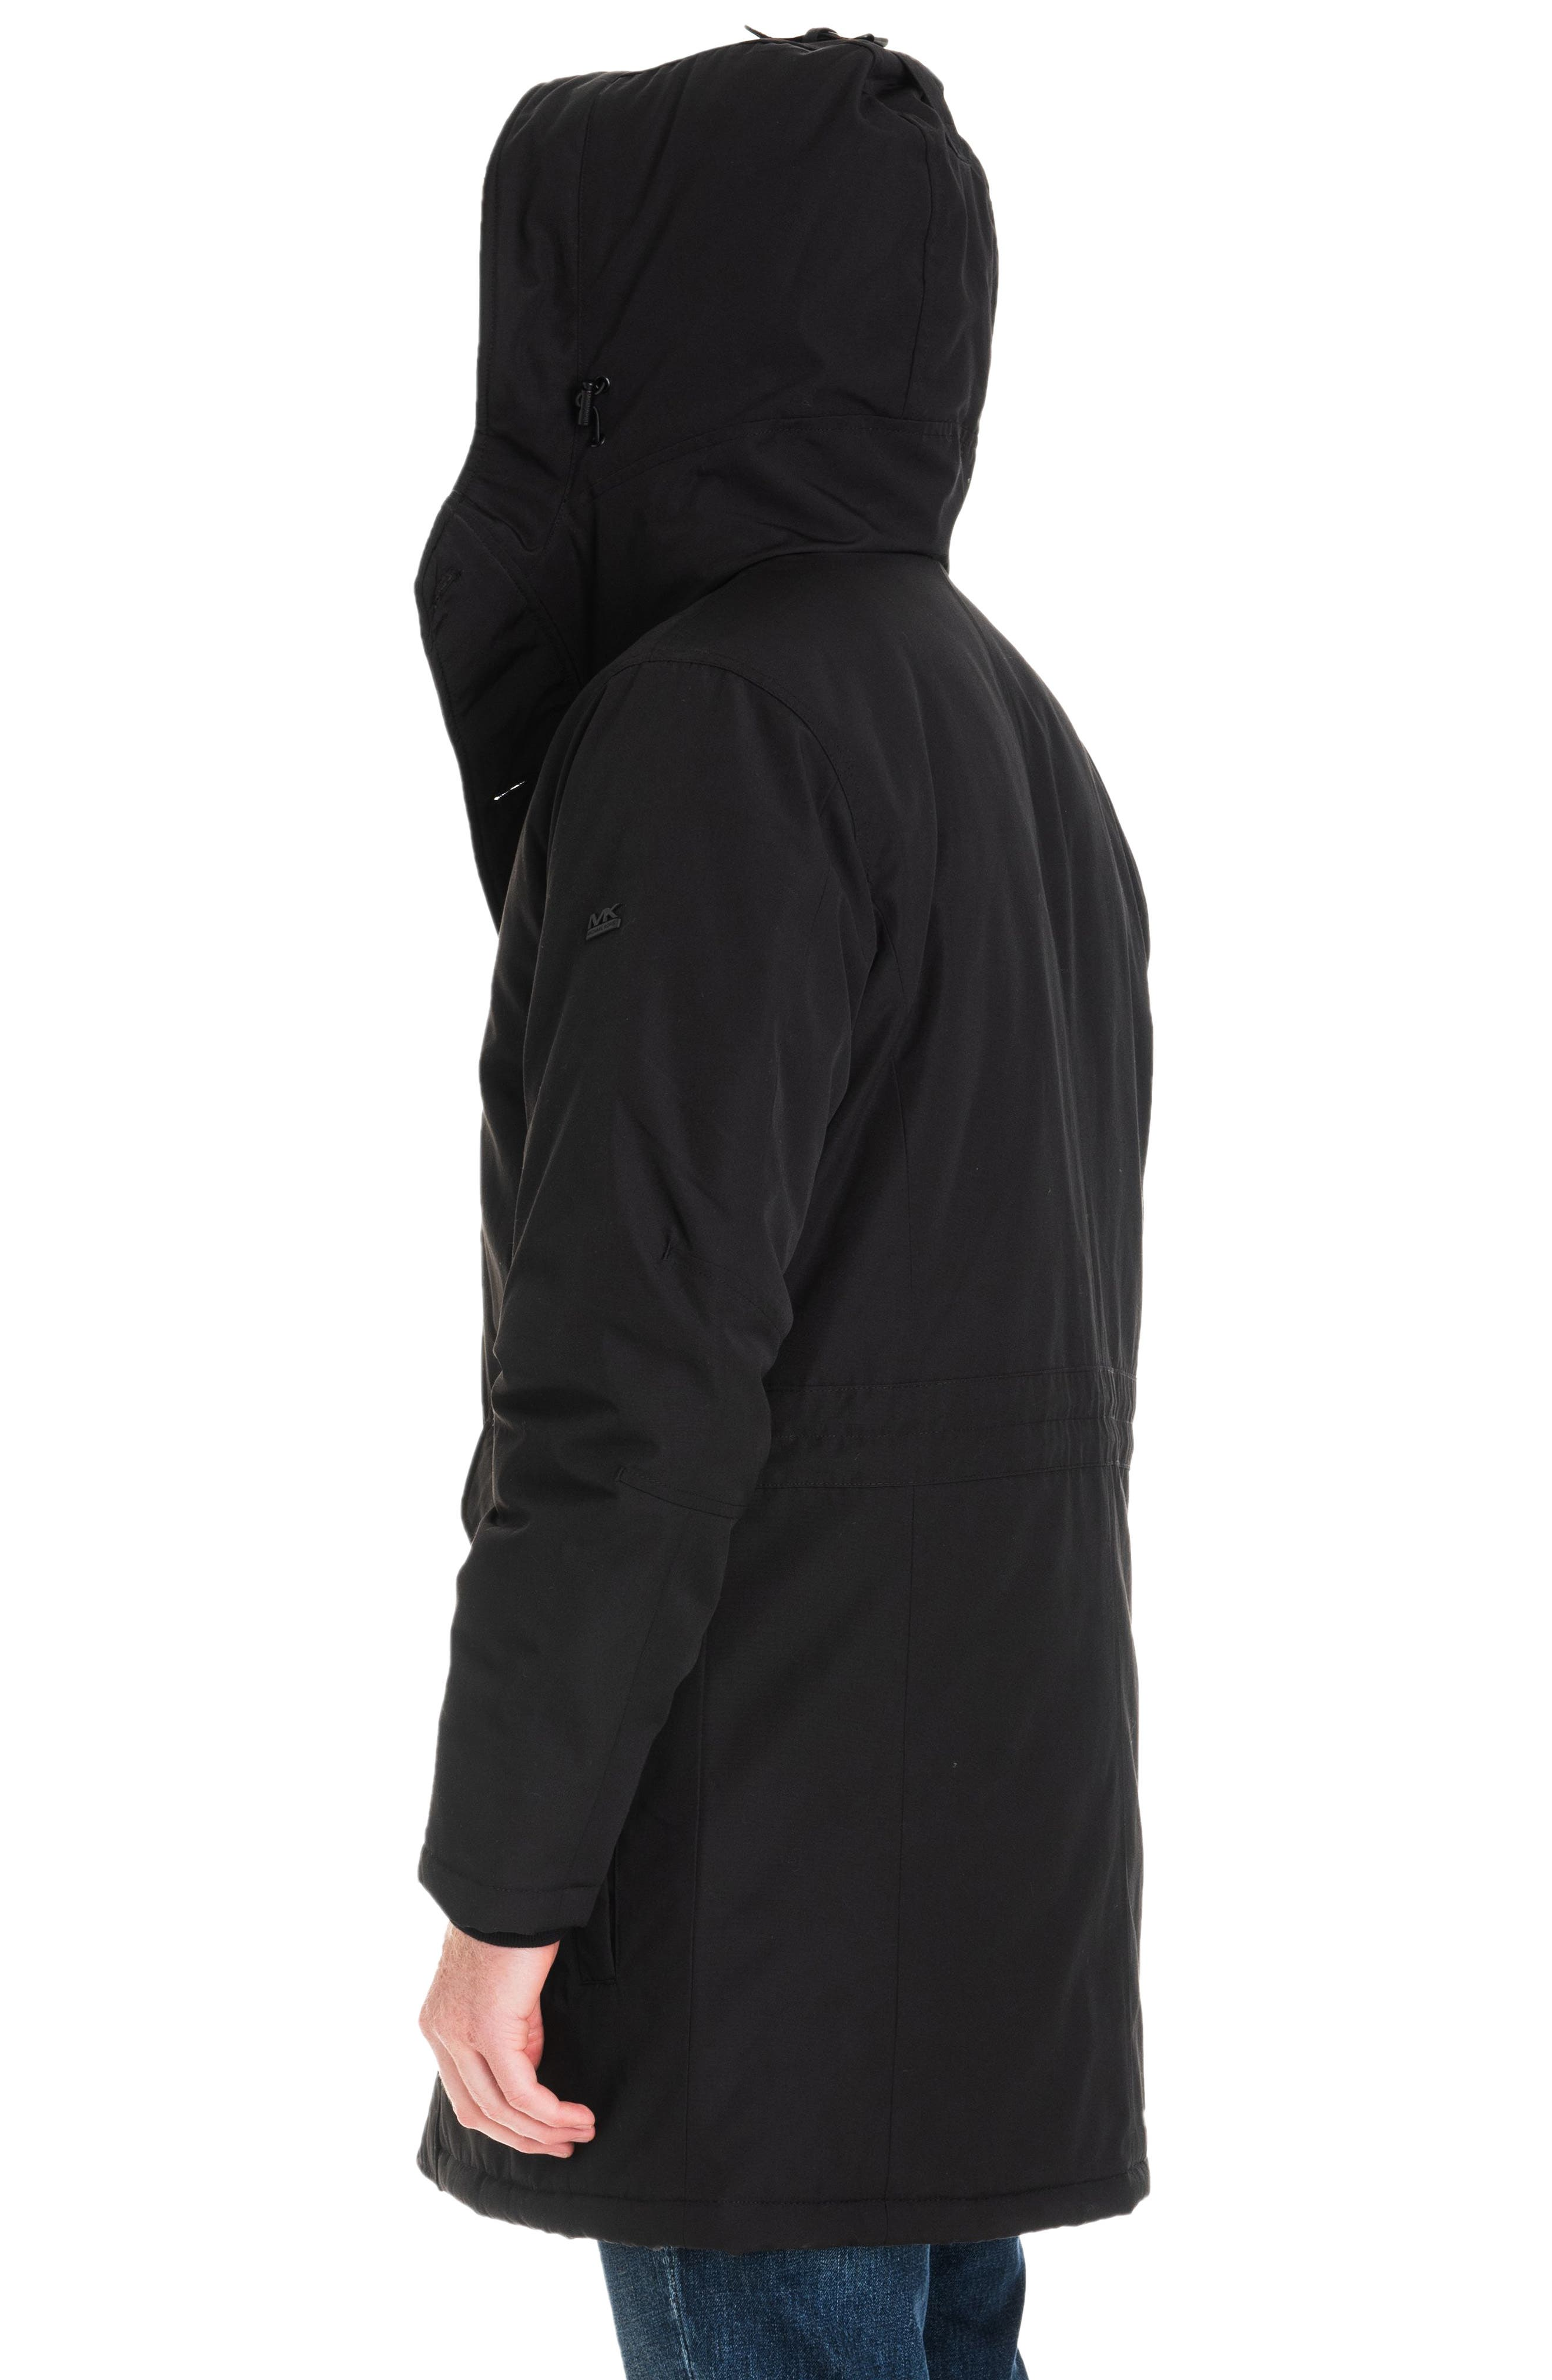 Gardiner Water Resistant Snorkel Coat,                             Alternate thumbnail 7, color,                             BLACK/ MIDNIGHT